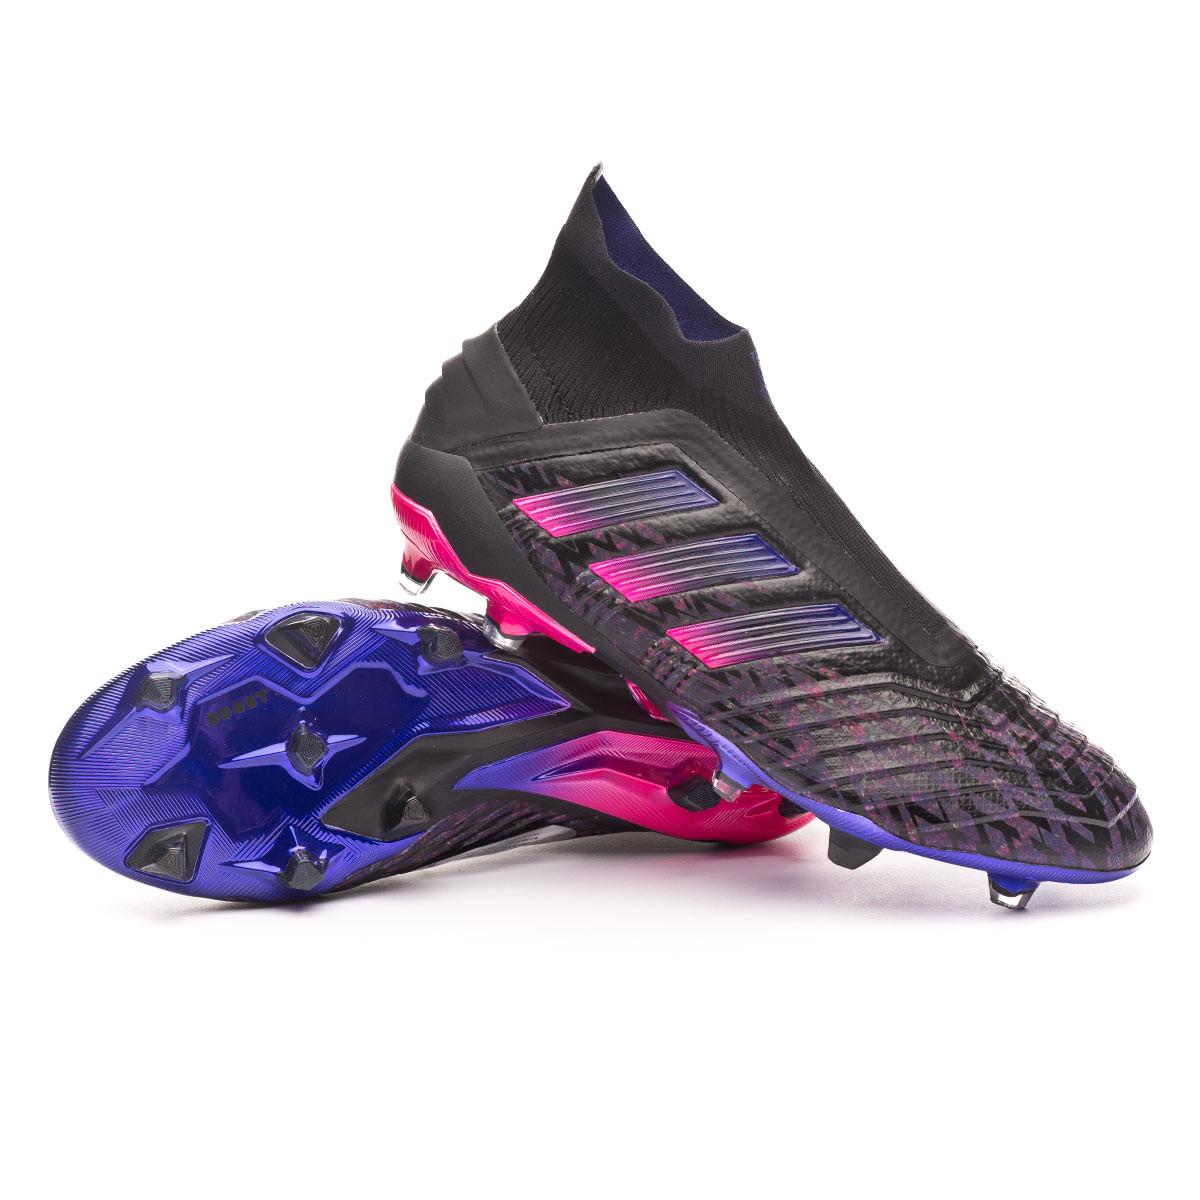 Scarpe adidas Predator 19+ FG Paul Pogba